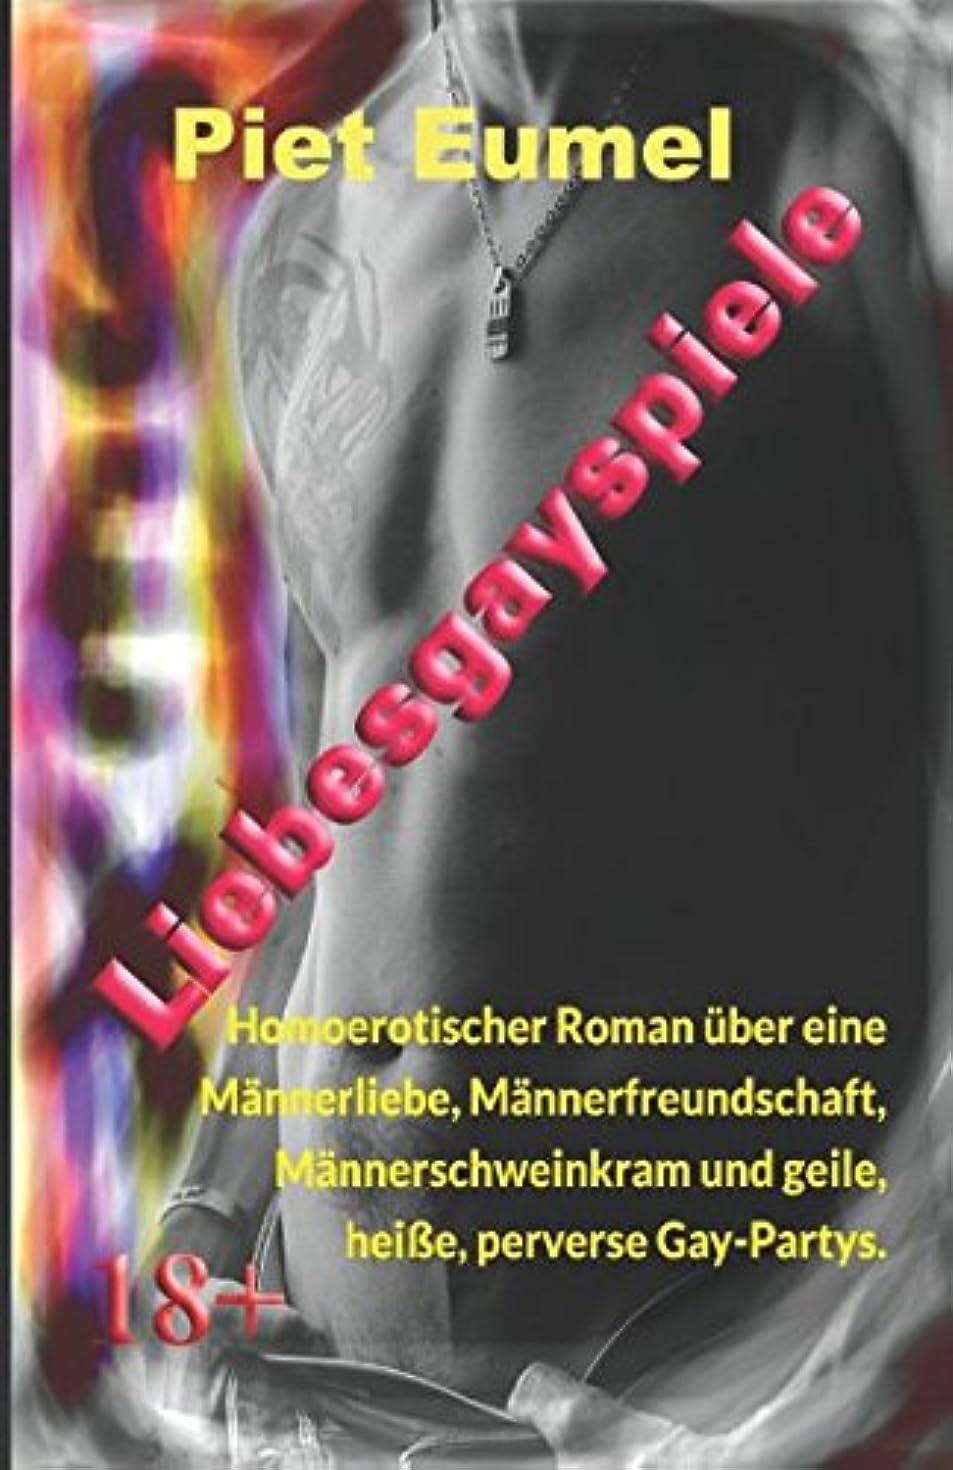 重なる育成頑張るLiebesgayspiele: Homoerotischer Roman ueber eine Maennerliebe, Maennerfreundschaft, Maennerschweinkram und geile, heisse, perverse Gay-Partys.